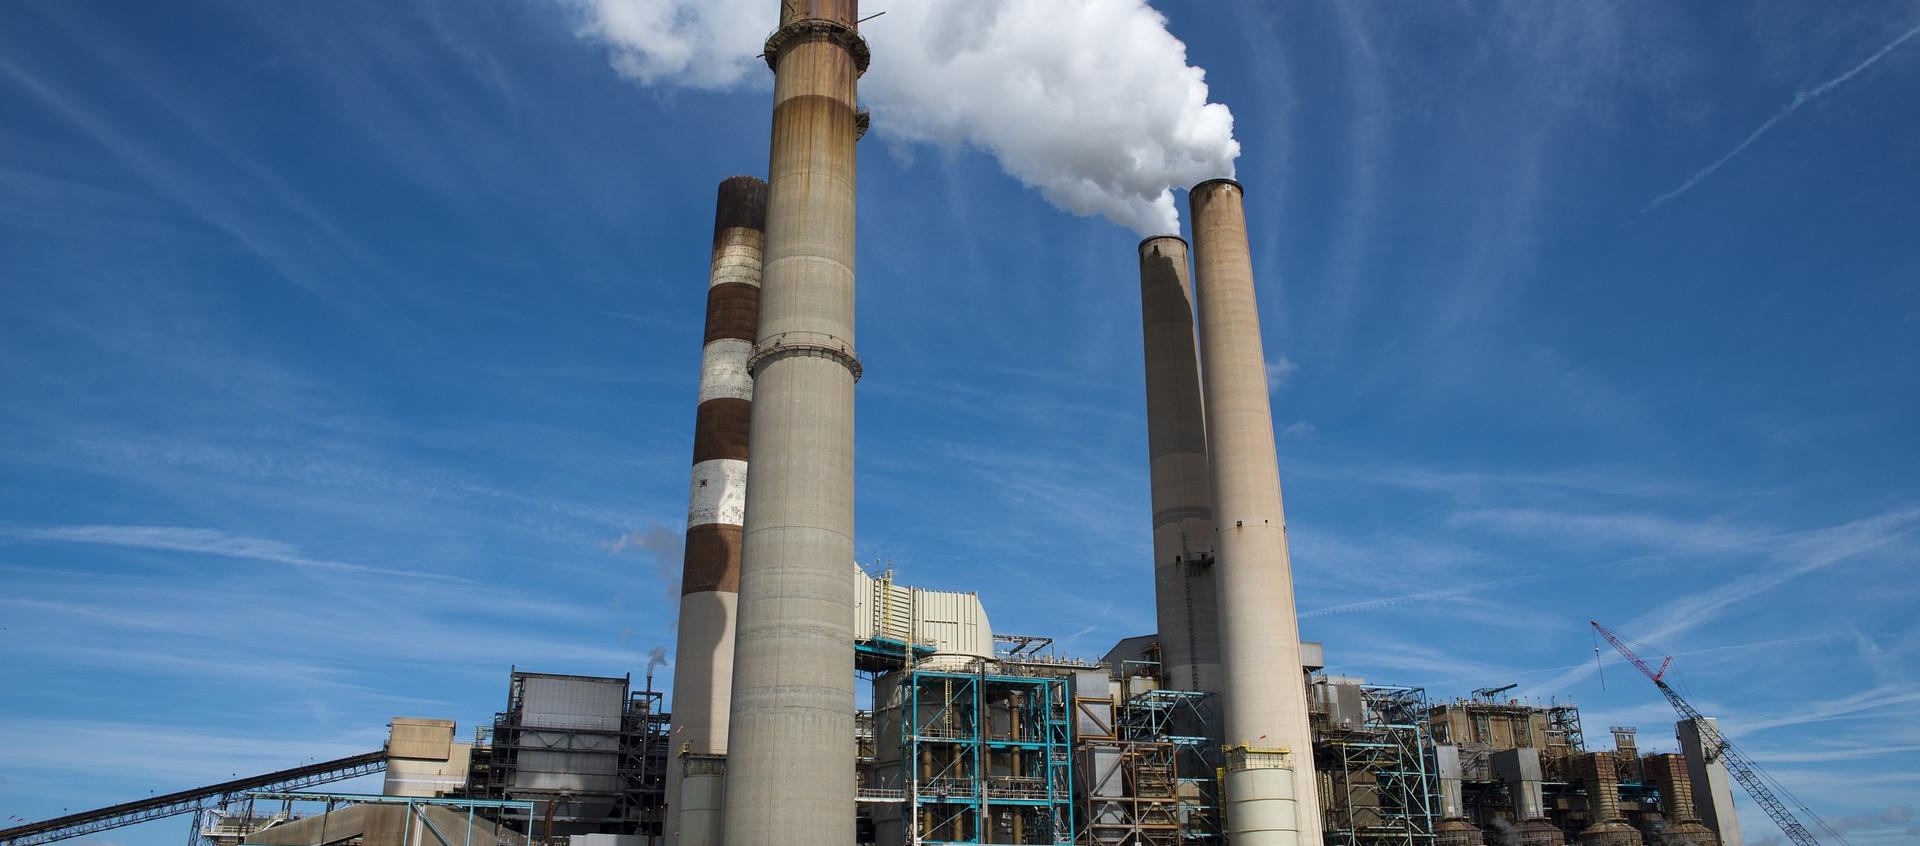 WEC Energy Group plans to shut down Oak Creek coal plants by 2024